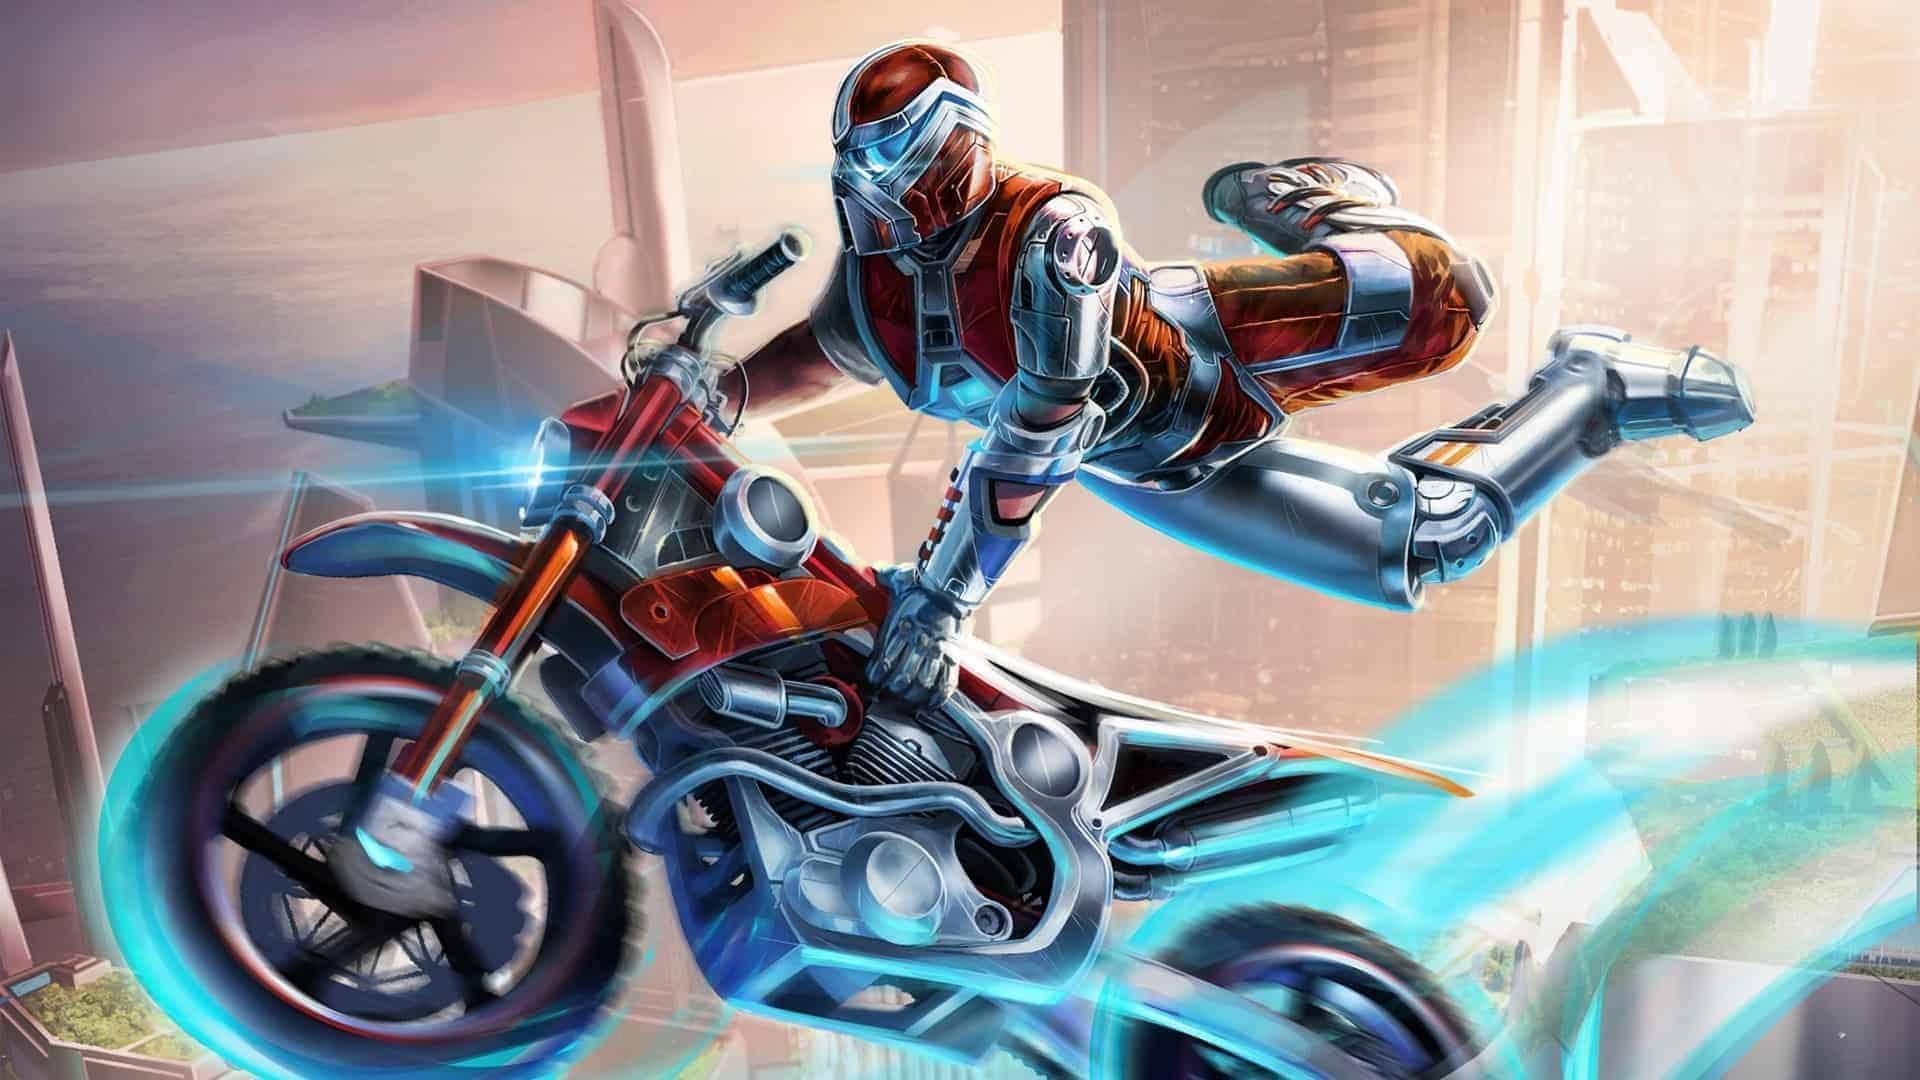 artwork_motorbikes_trials_fusion_1920x1080_70383